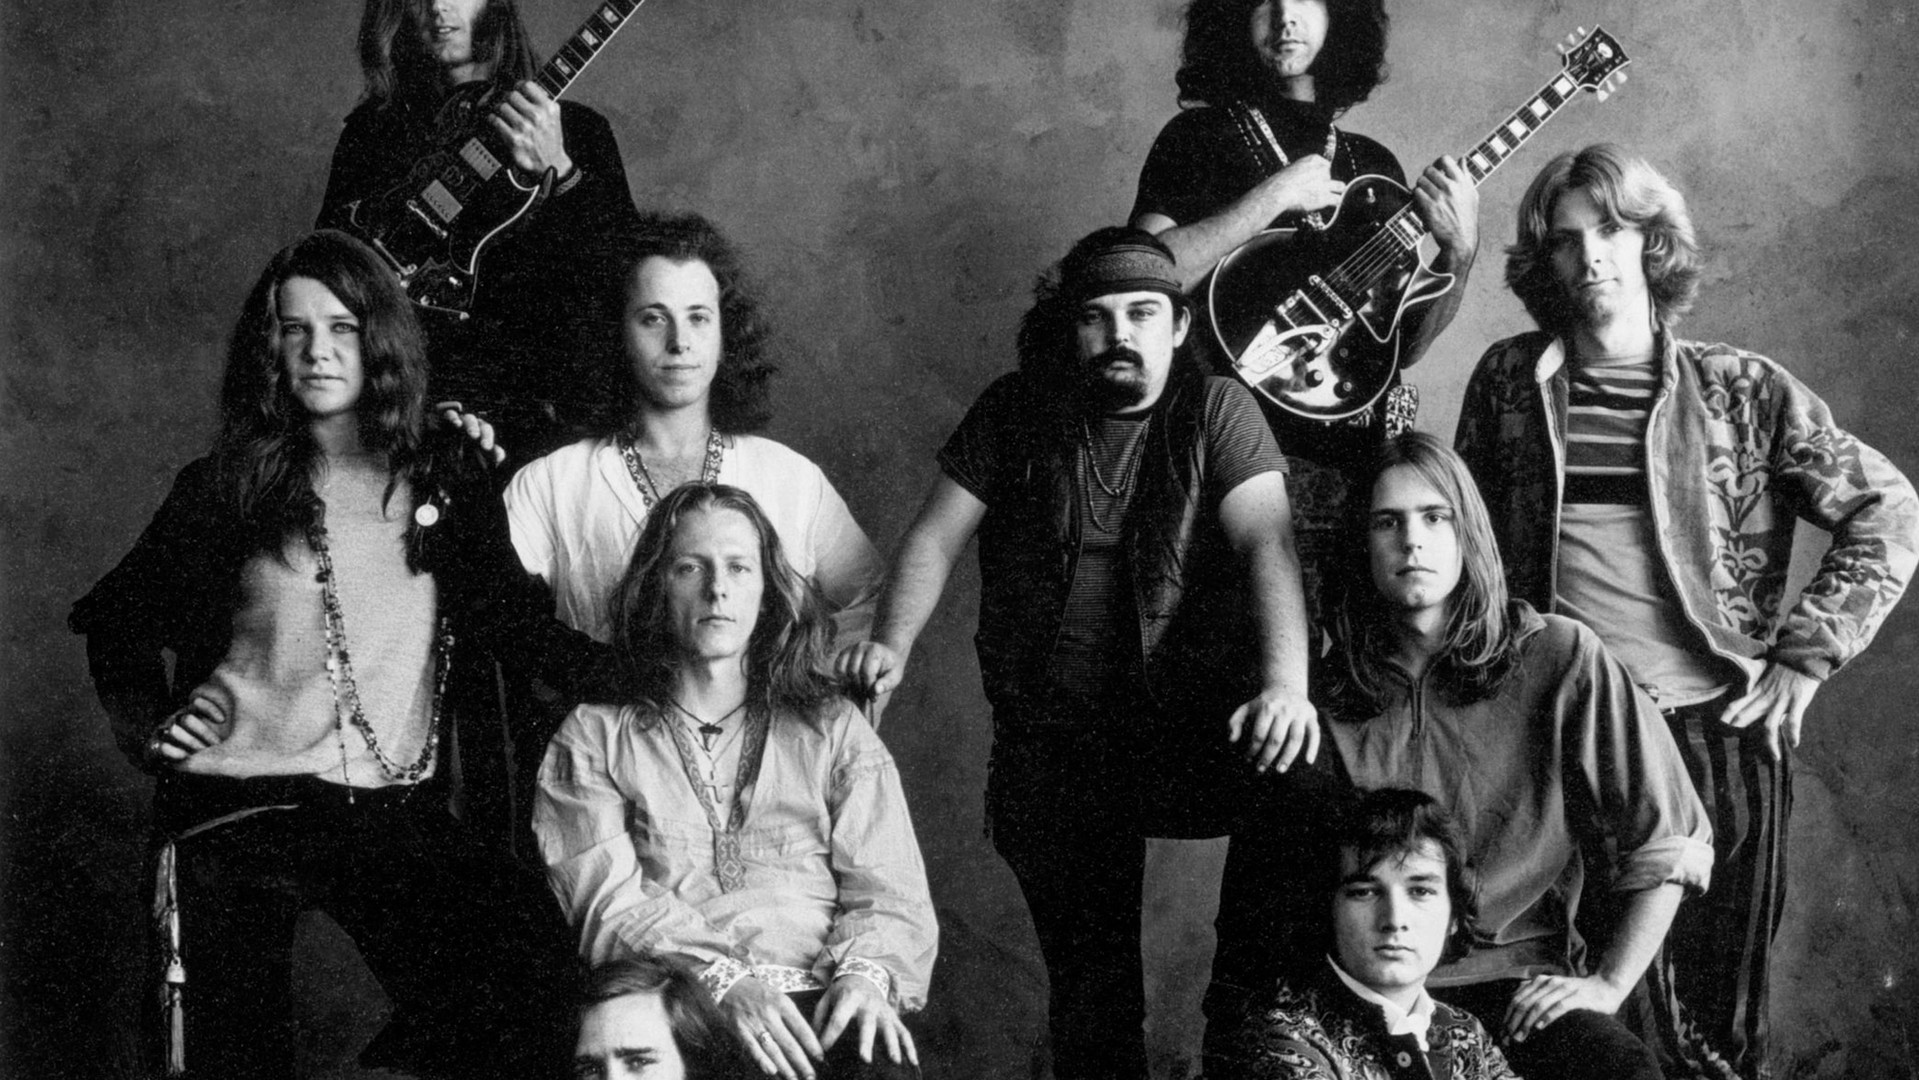 Irving Penn, Rock Groups, San Francisco, 1967